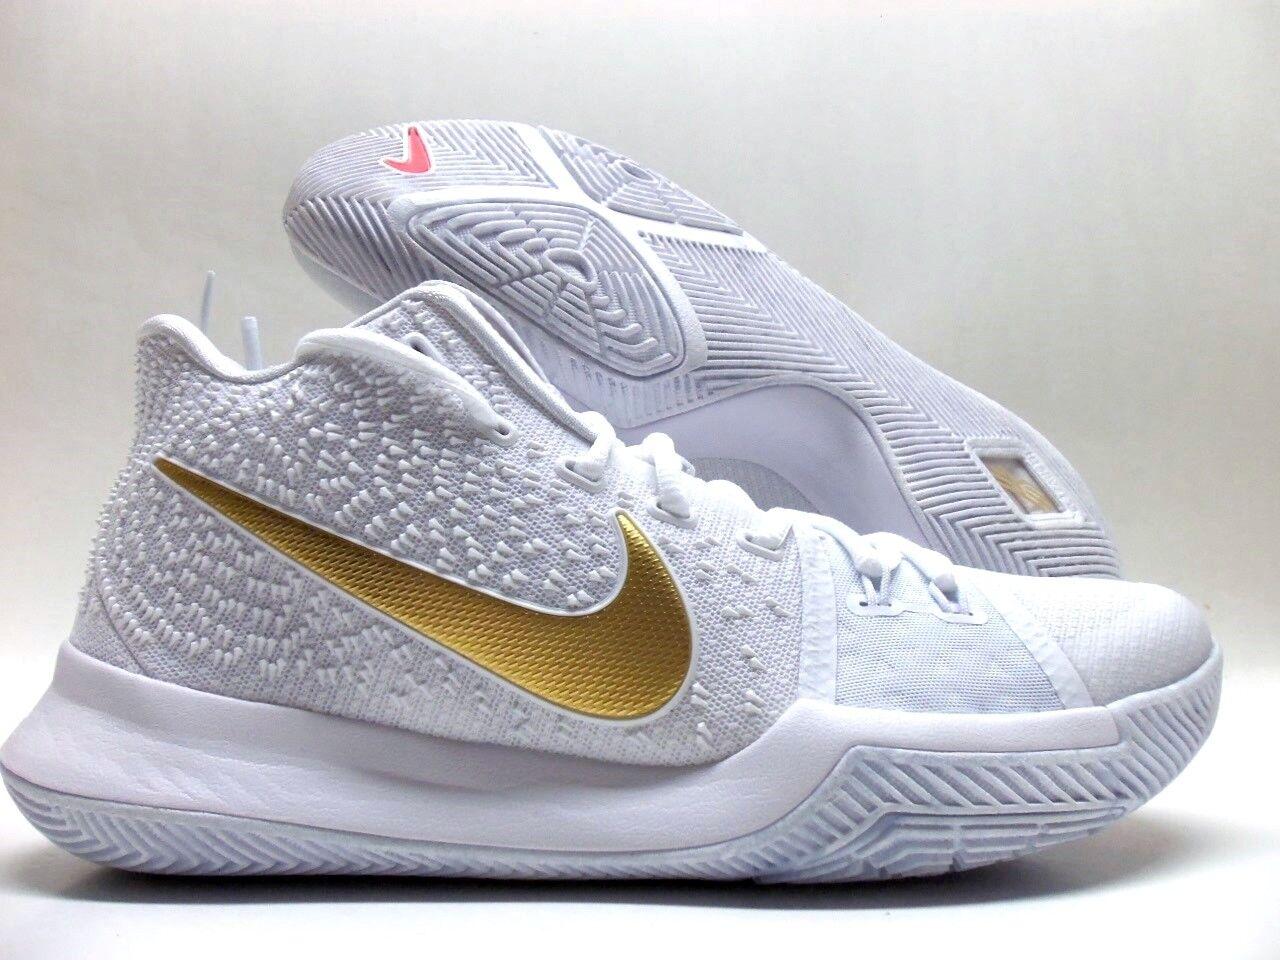 Nike kyrie 3 ep finale bianca / oro metallico dimensioni uomini 10 [852395-902]